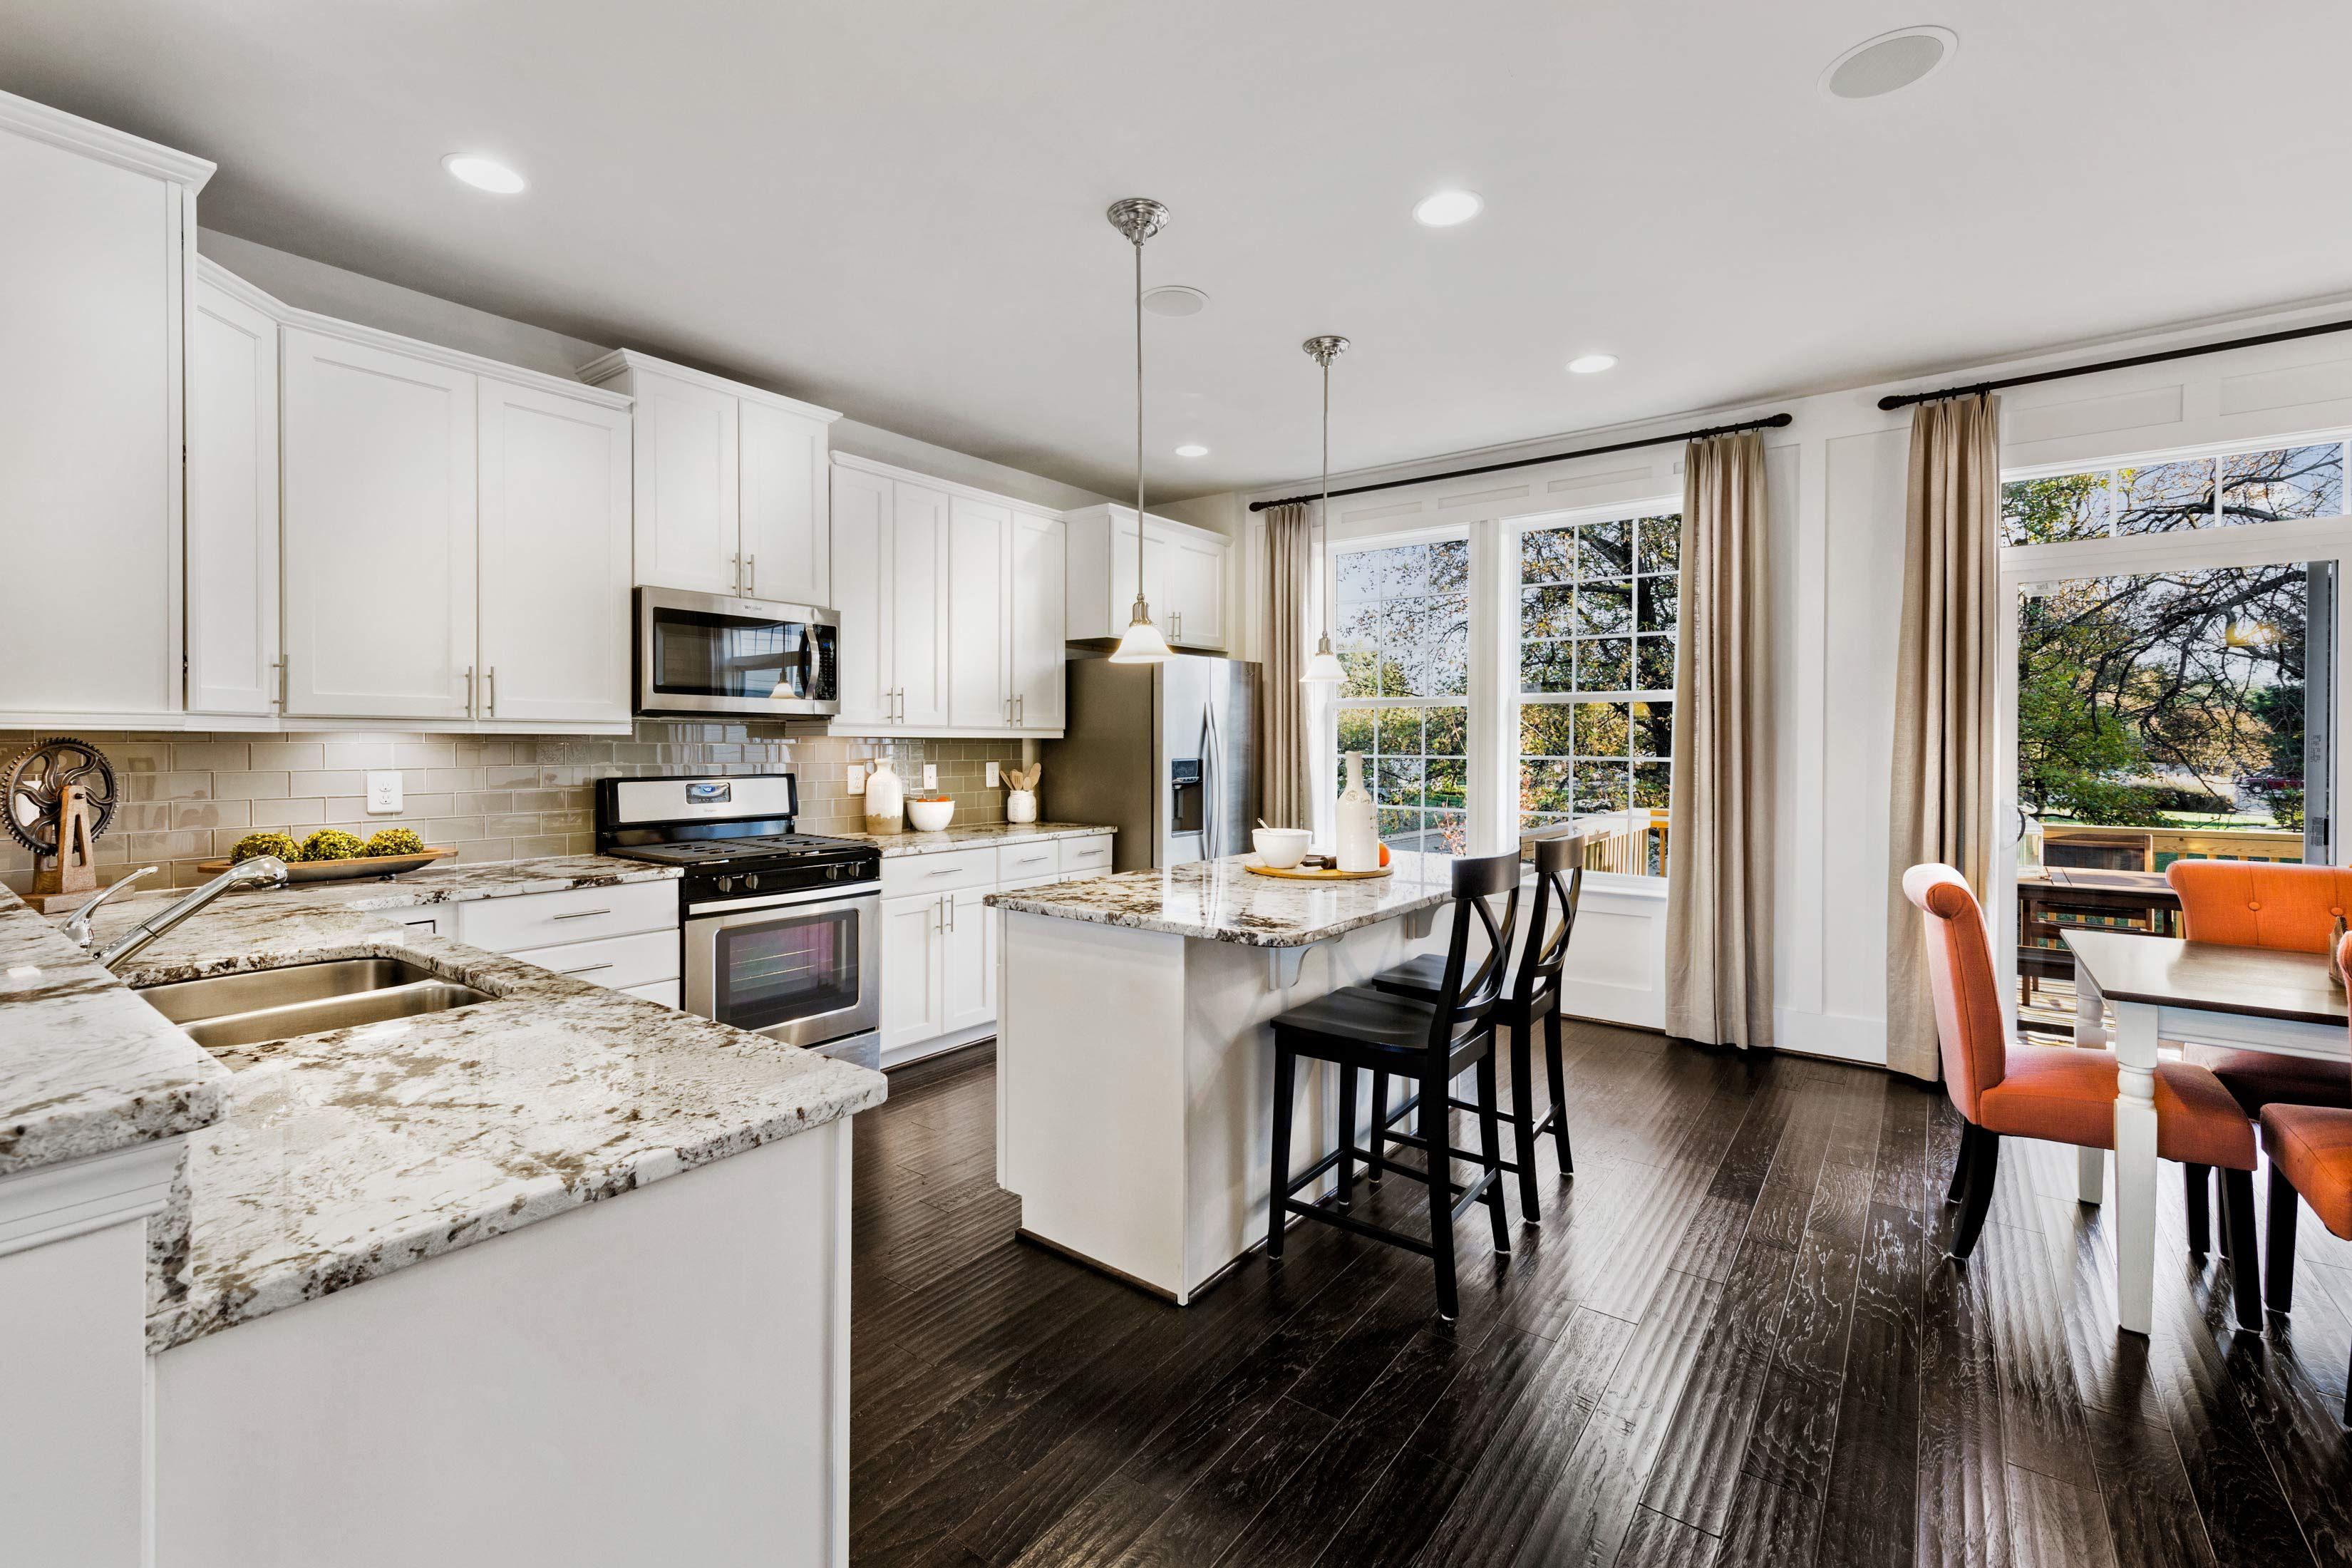 Beautiful Open Floorplan Kitchen Area And Dining Room In The Davenport Townhome Interior Design Photography Dan Ryan B Open Floor Plan Kitchen Home Townhouse